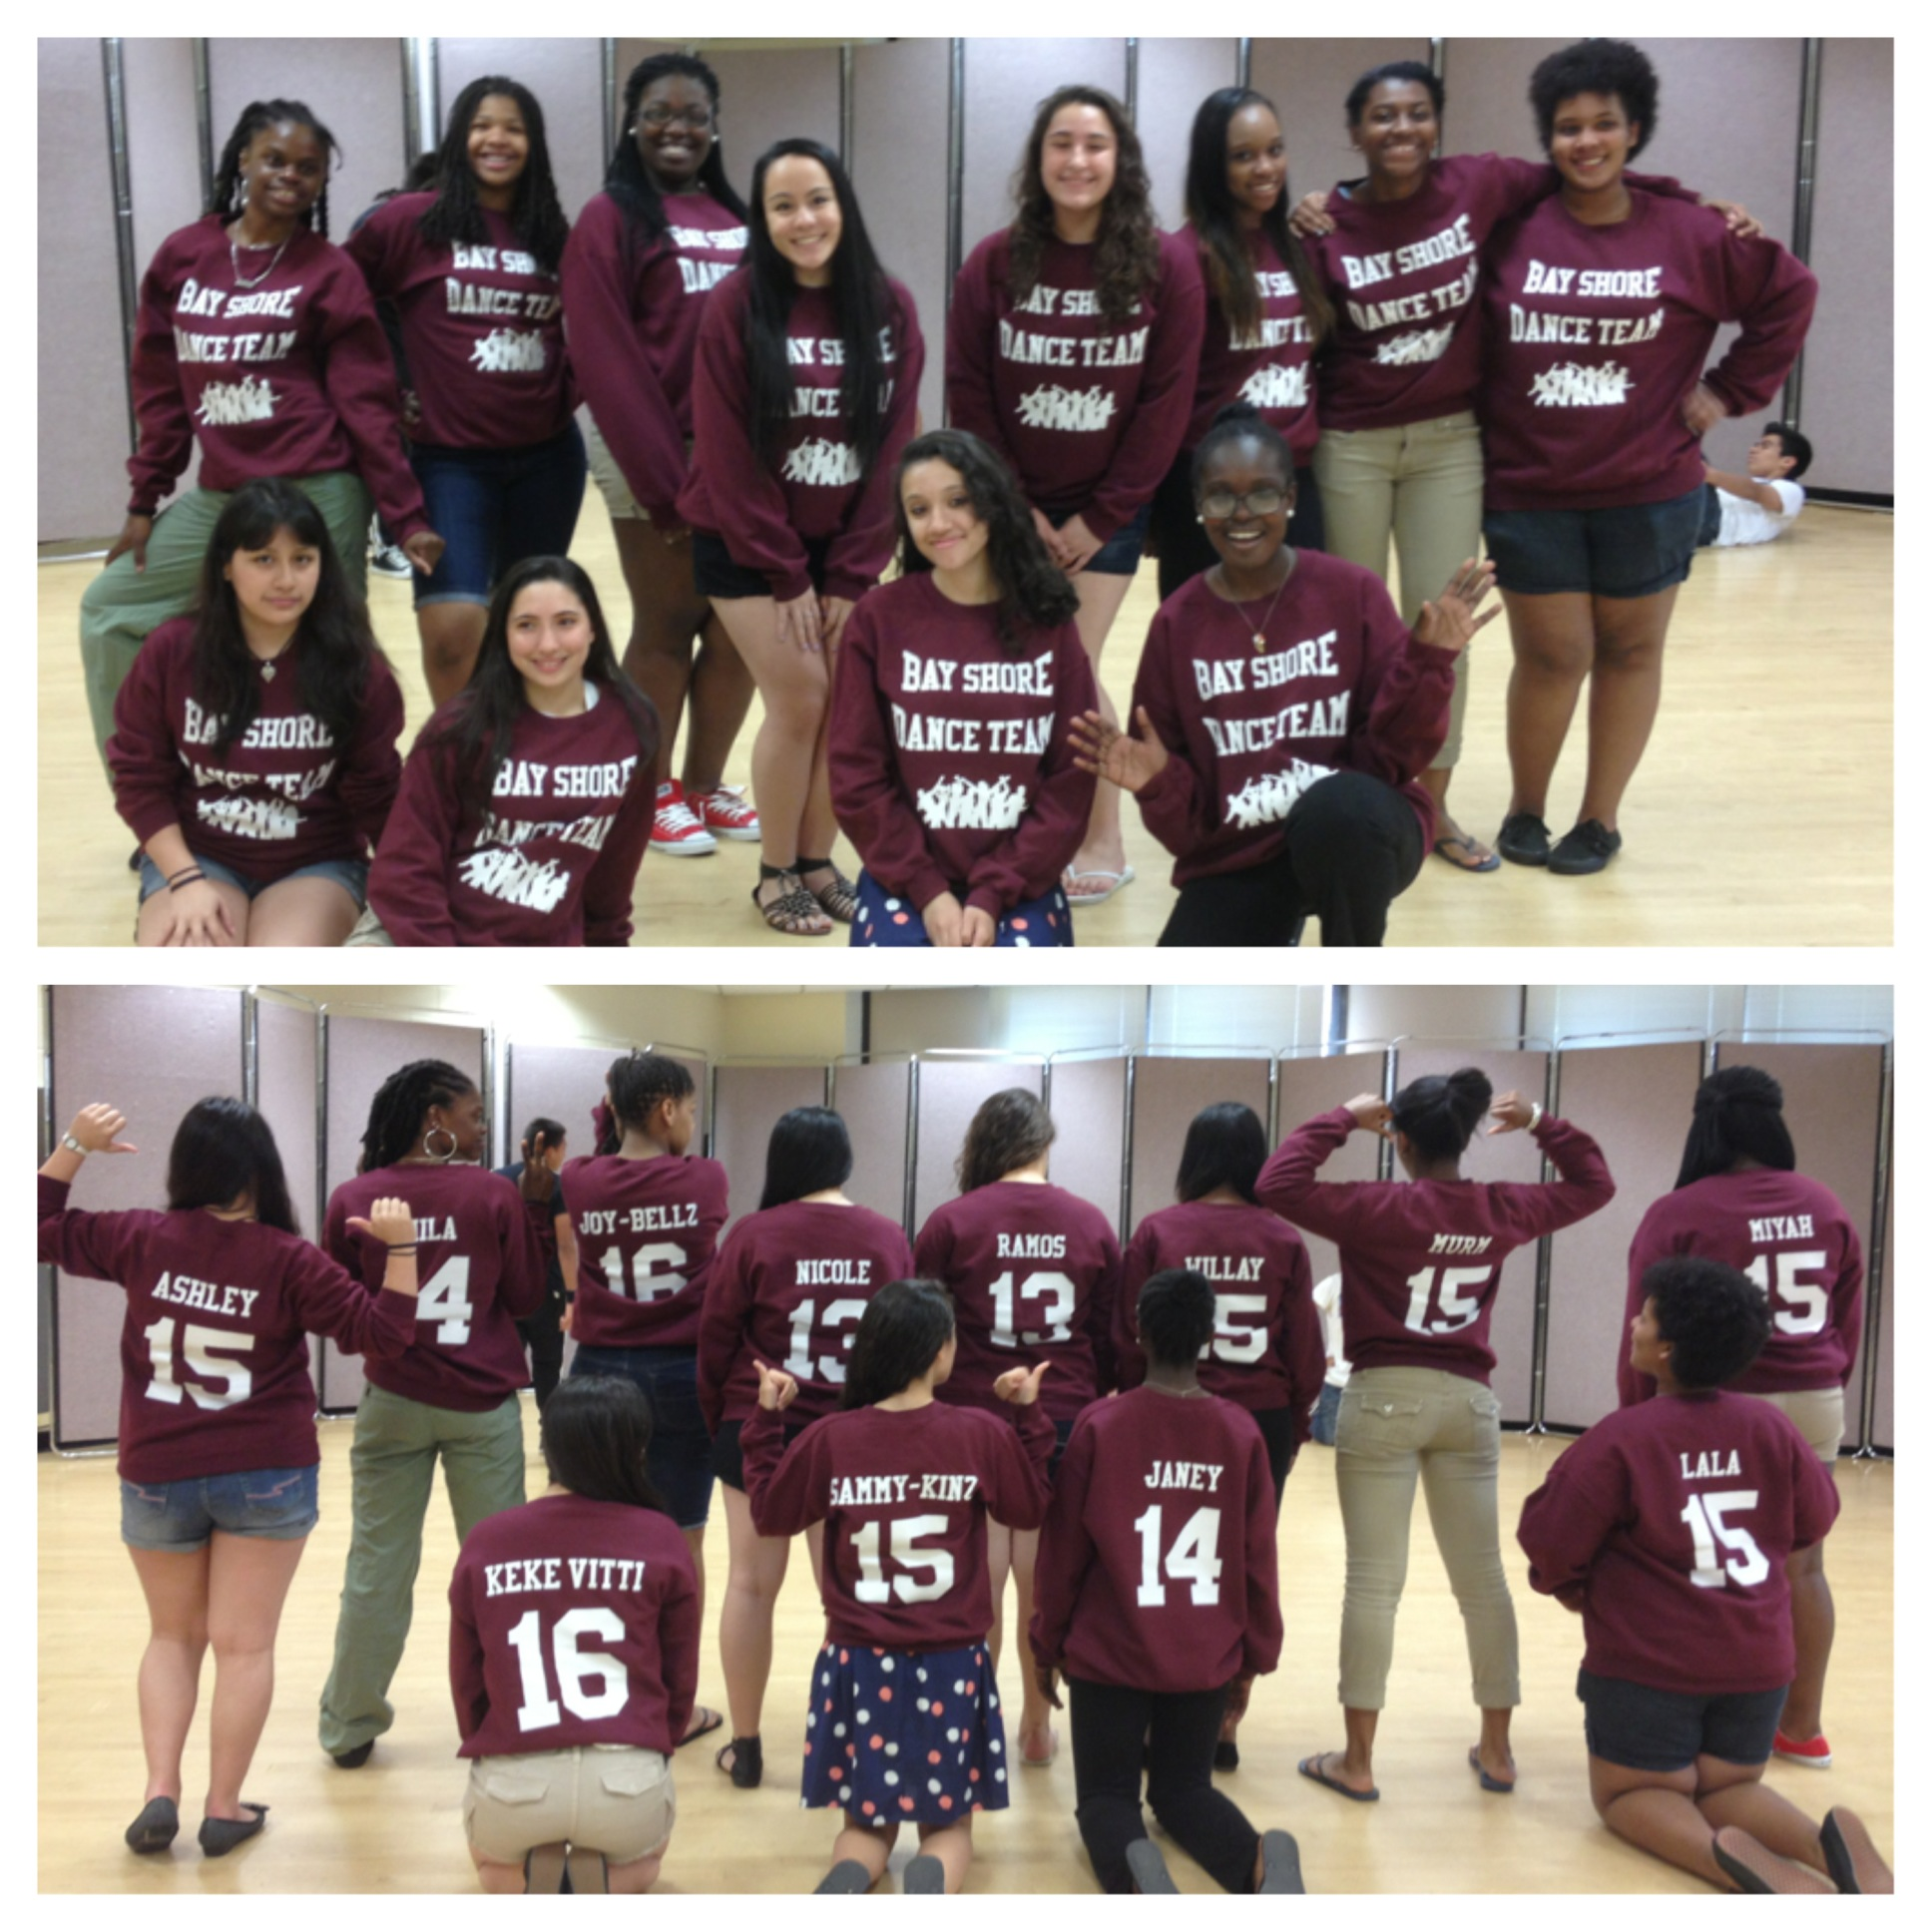 bay shore dance team rocks their new look d t shirt photo - Team T Shirt Design Ideas